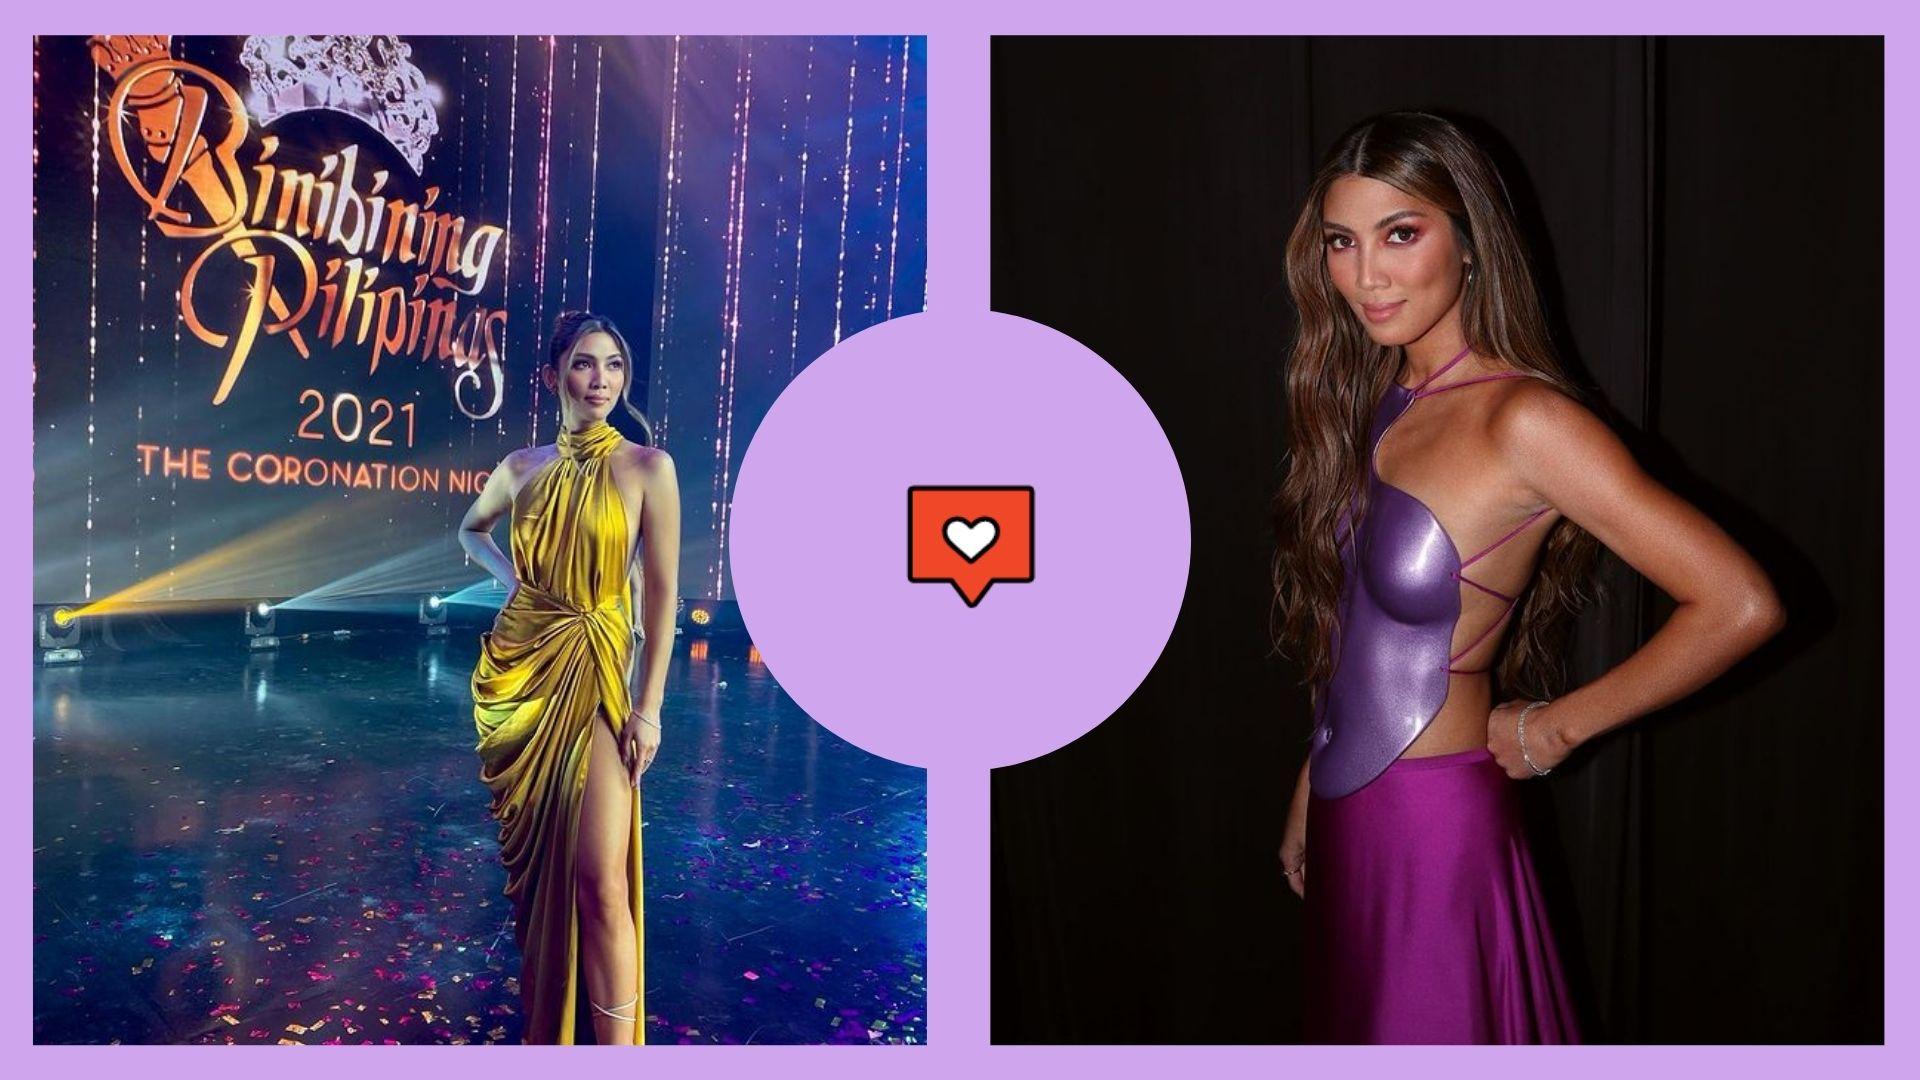 Nicole Cordoves' looks during the Binibining Pilipinas 2021 Coronation Night